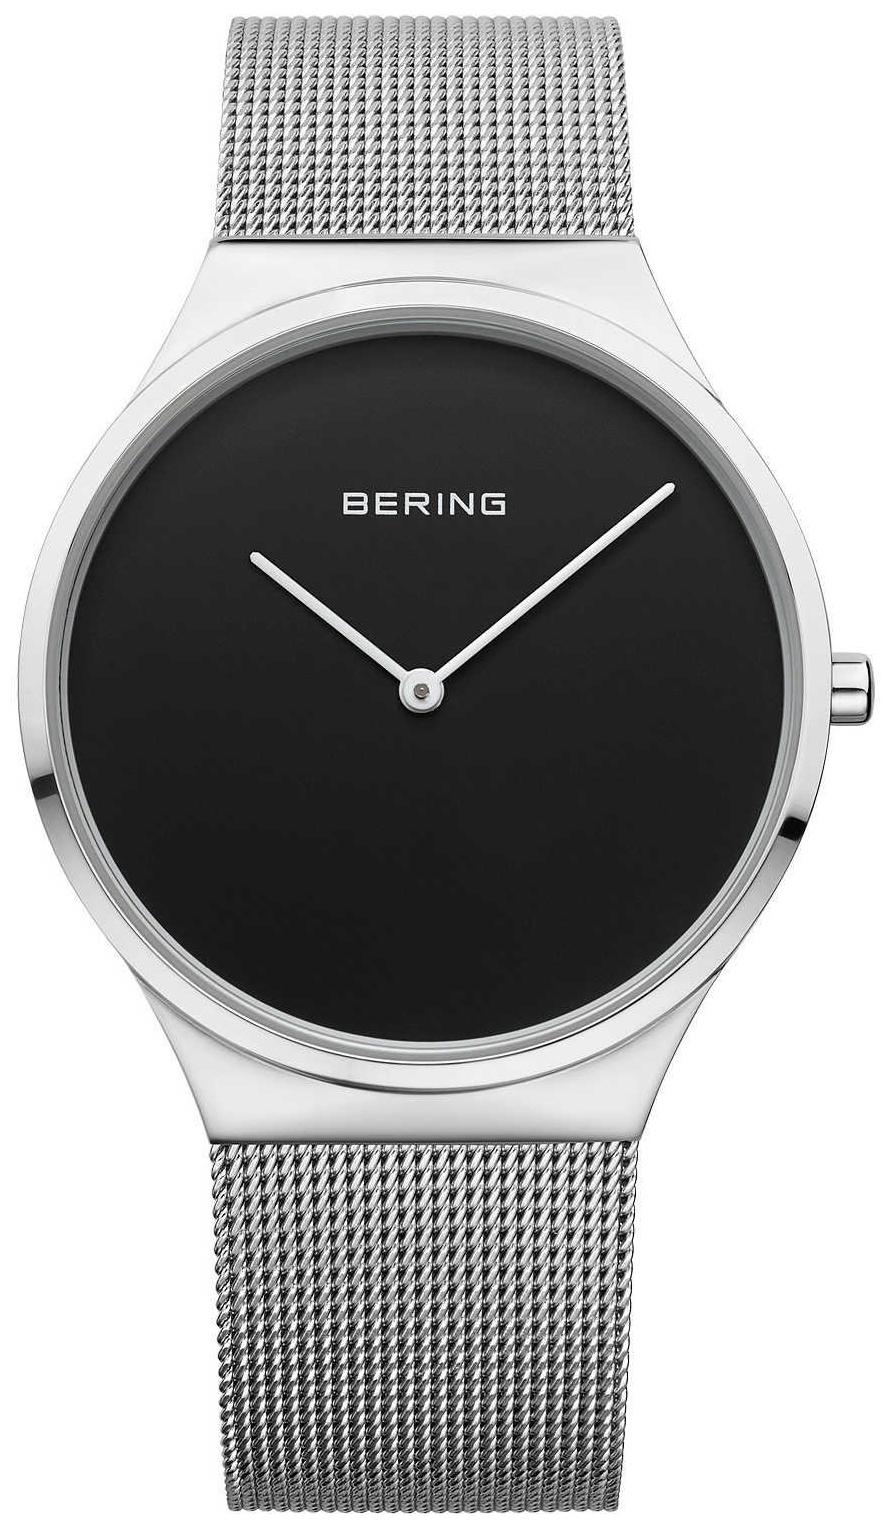 Bering Classic 12138-002 Sort/Stål Ø38 mm - Bering